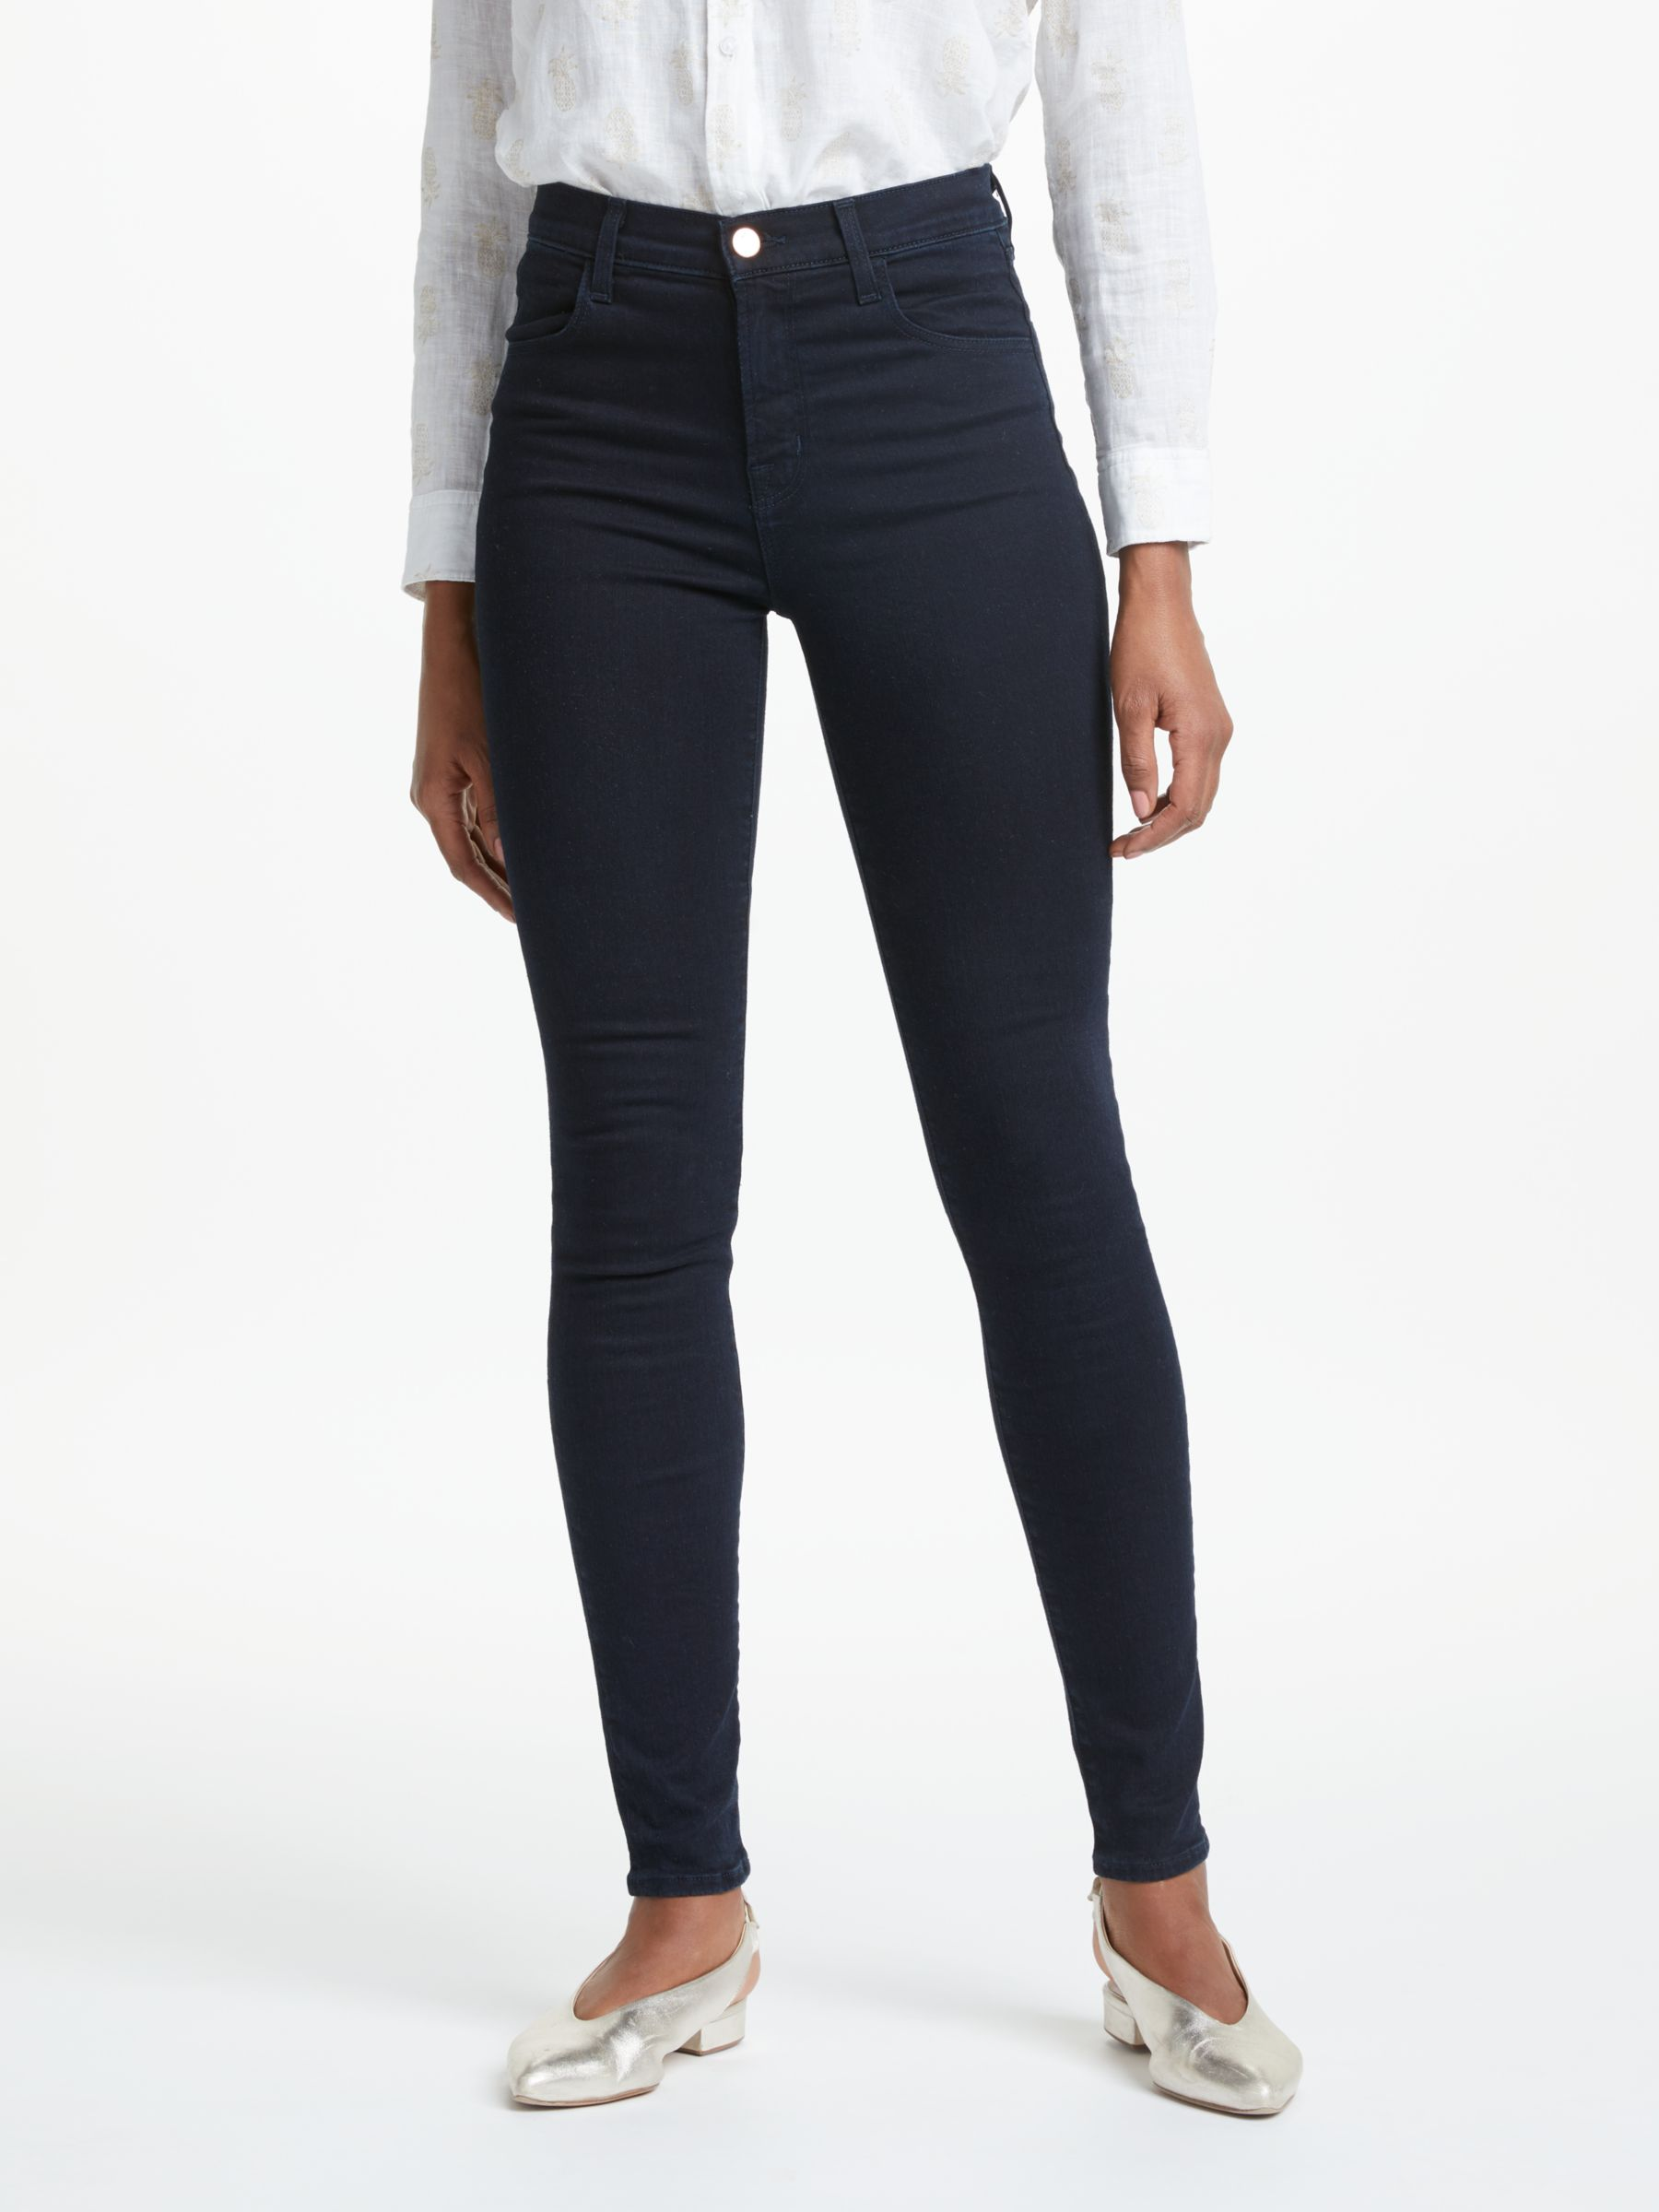 J Brand J Brand Maria High Rise Skinny Jeans, Bluebird